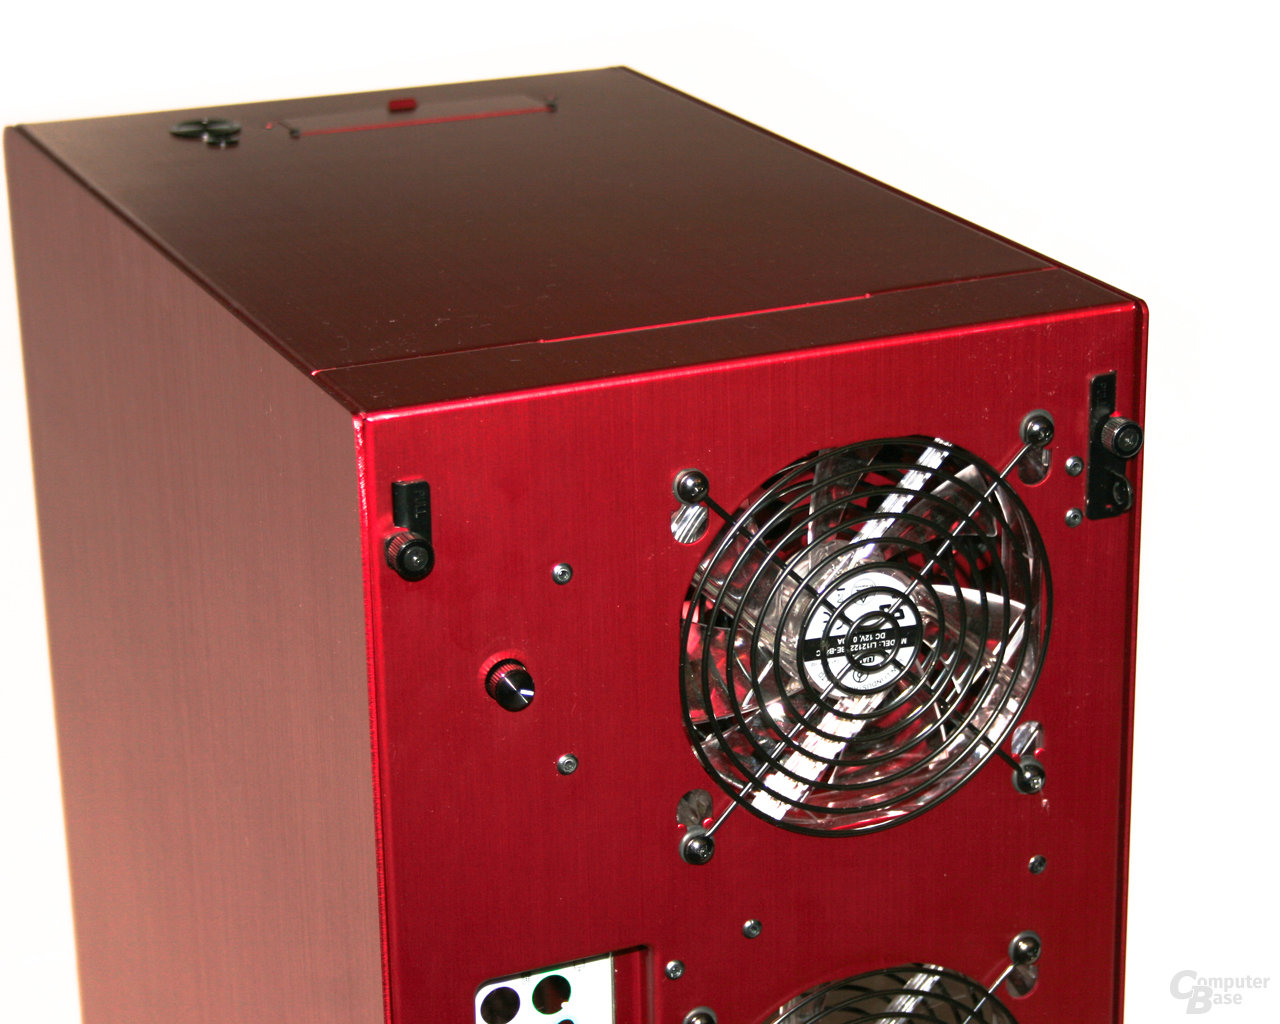 Lian Li PC-X900R – Drehzahlregler